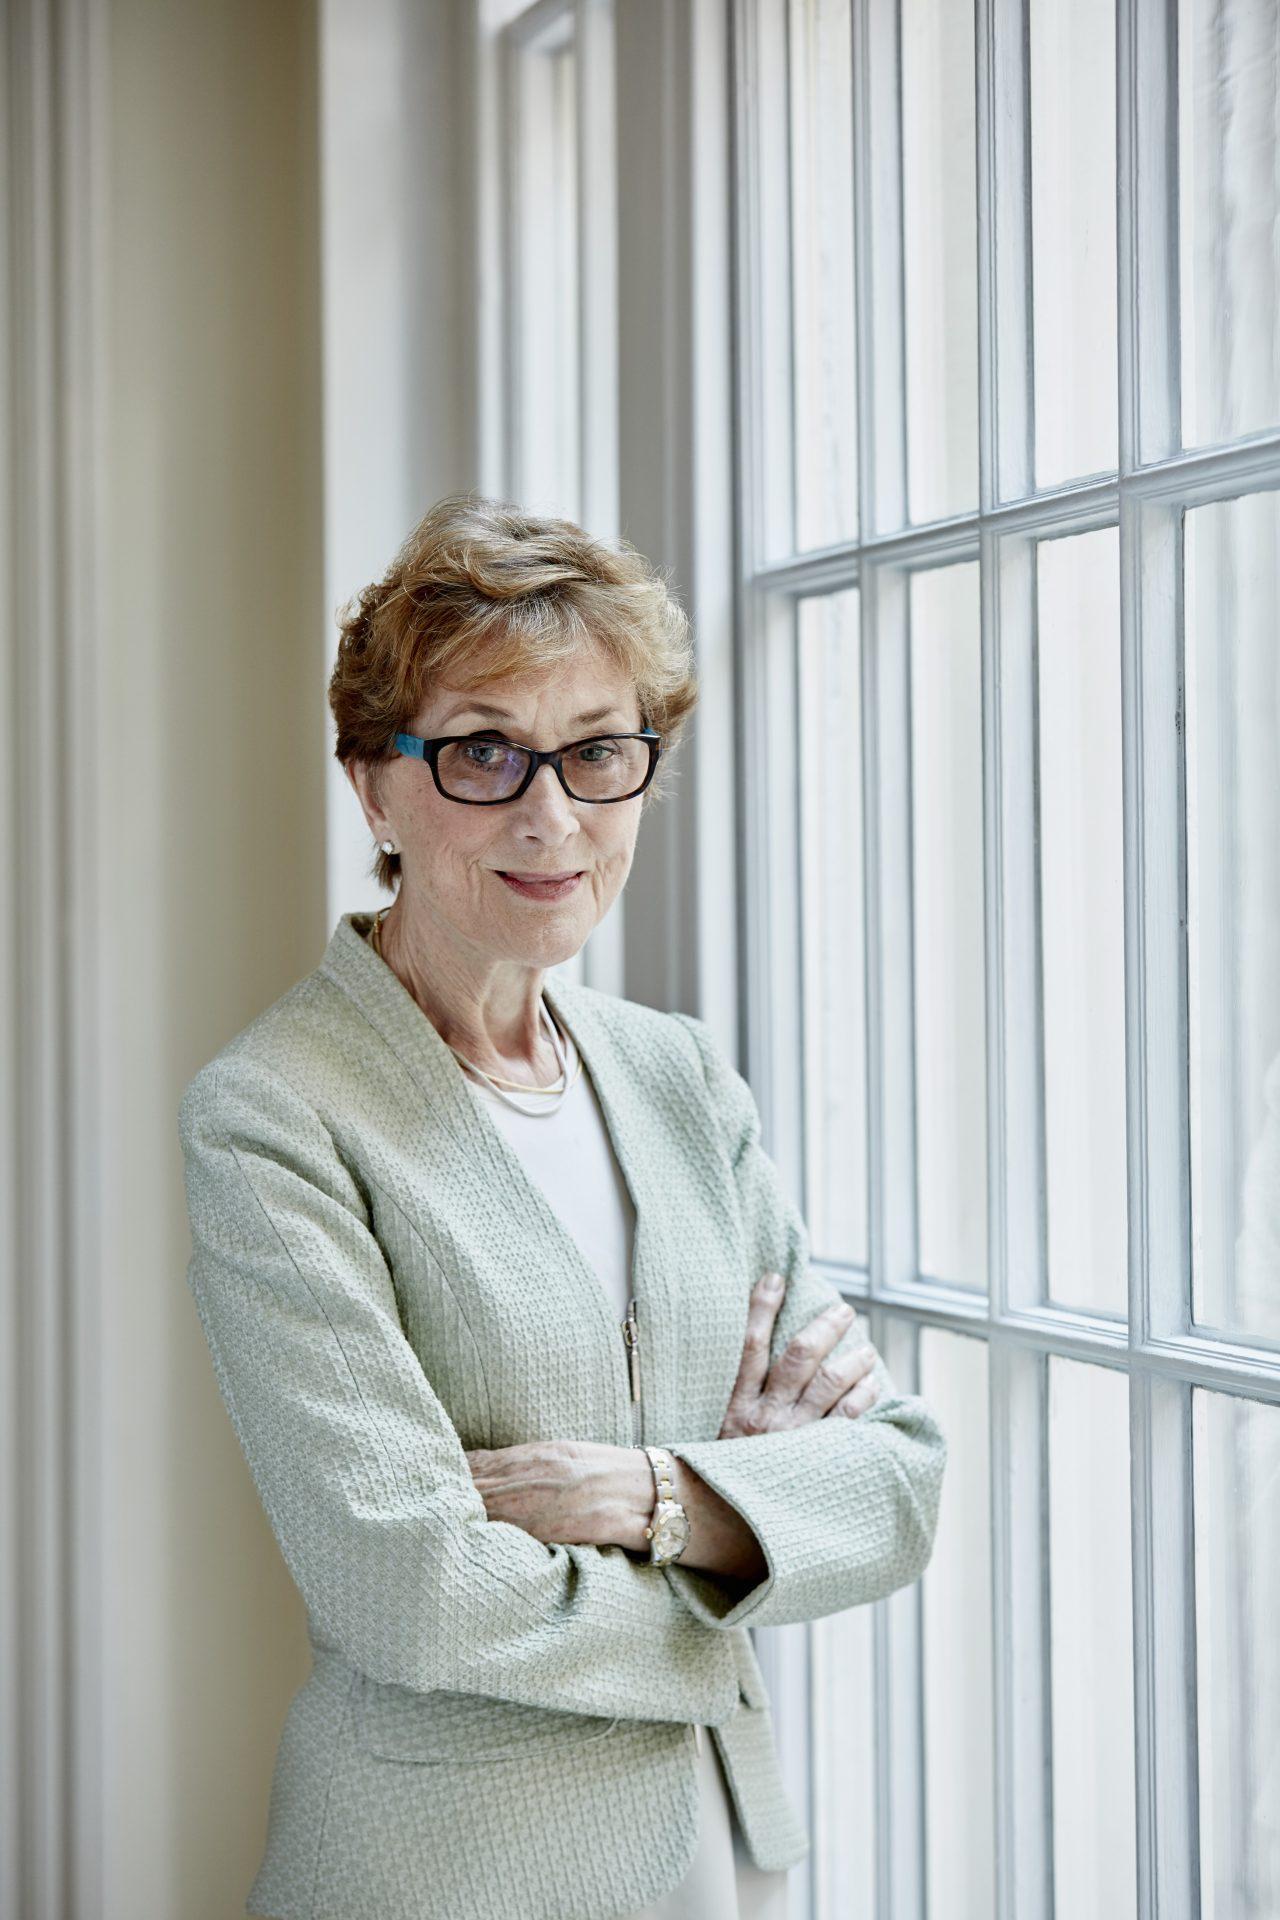 Professor-Dame-Carol-Black-2018-lr-3-1280x1920.jpg